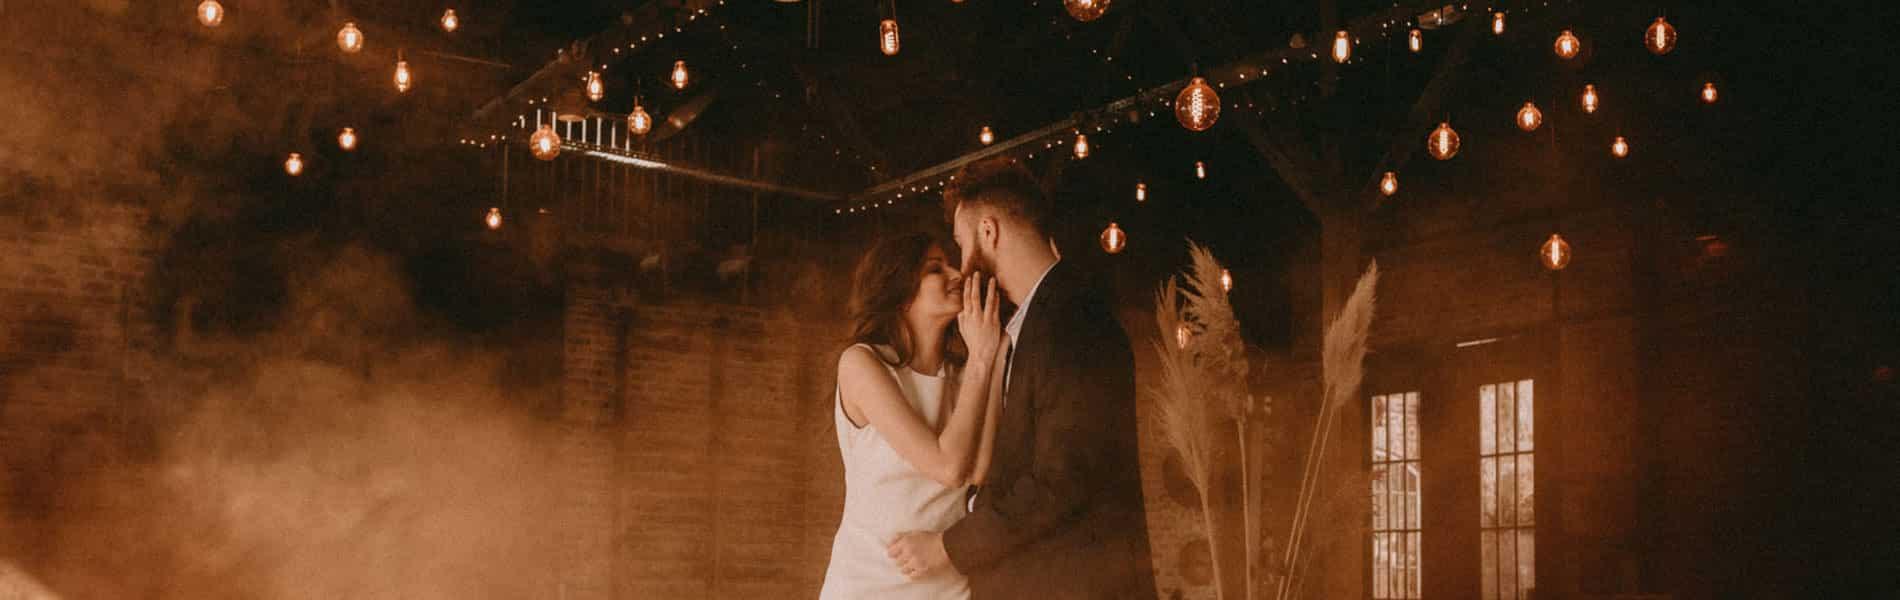 photographe de mariage chateau-barthelemy